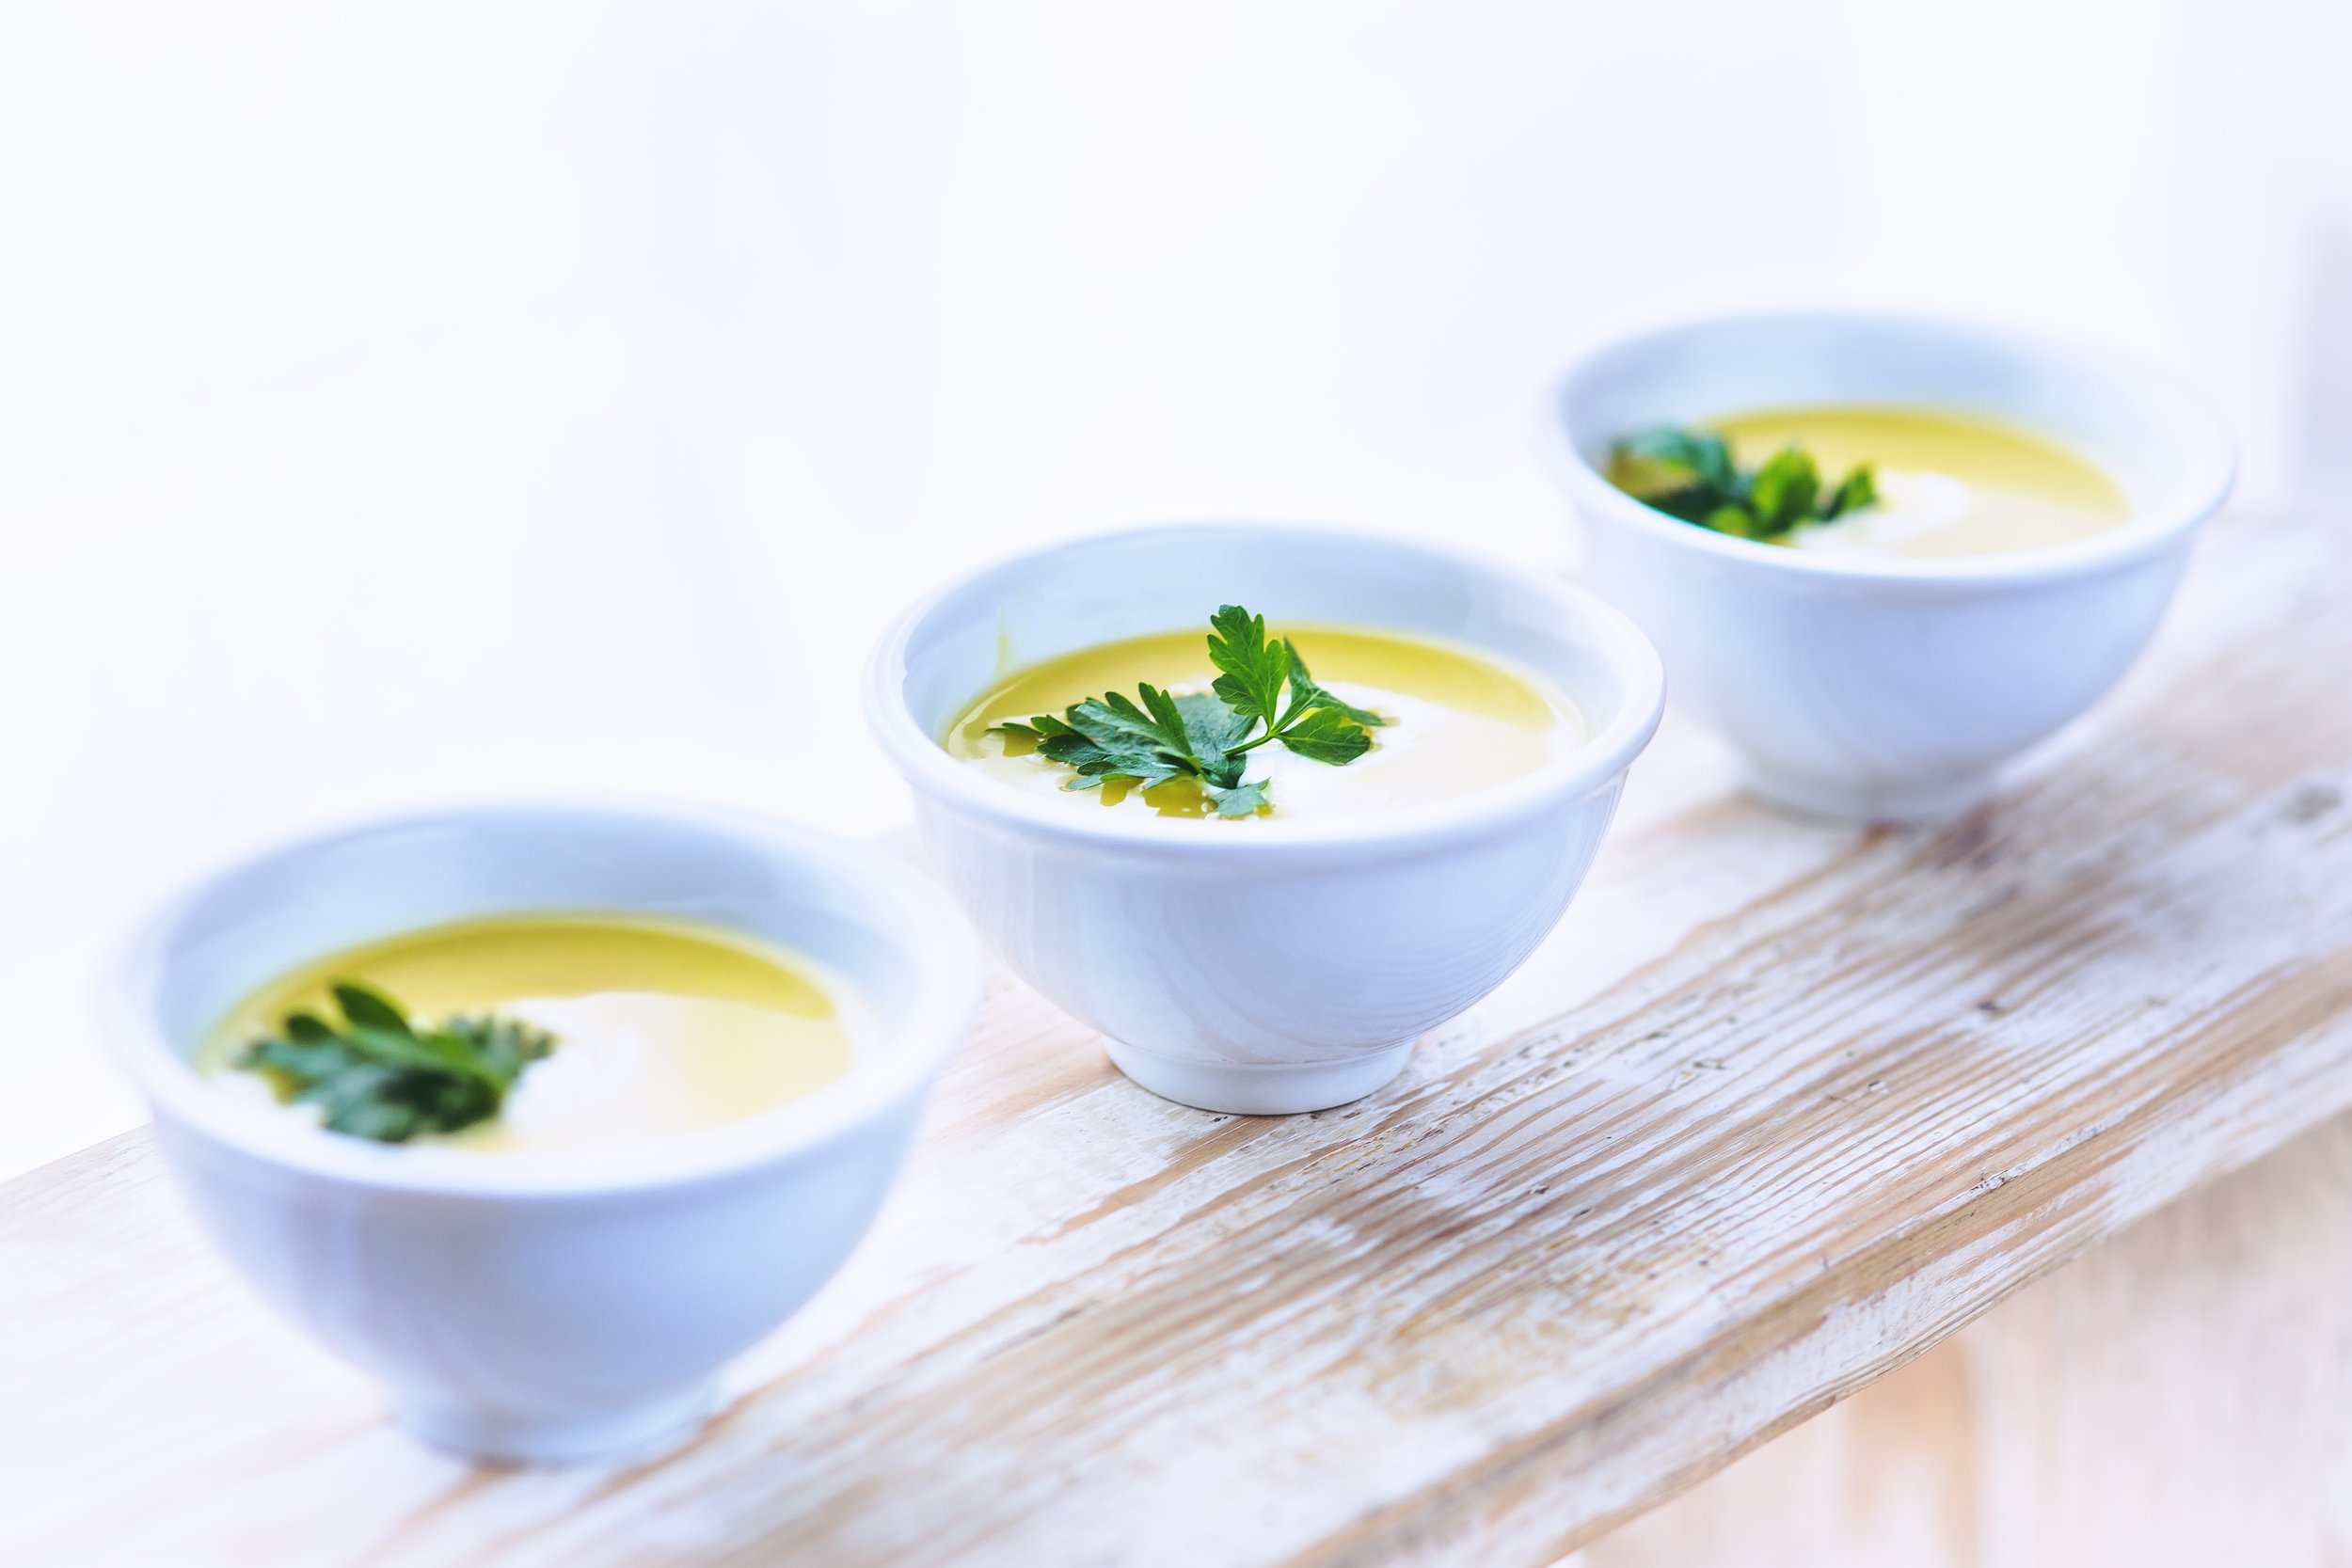 uwm.recipe.dr.gundry.leek.cauliflower.soup.delicious-dinner-food-5791.jpg